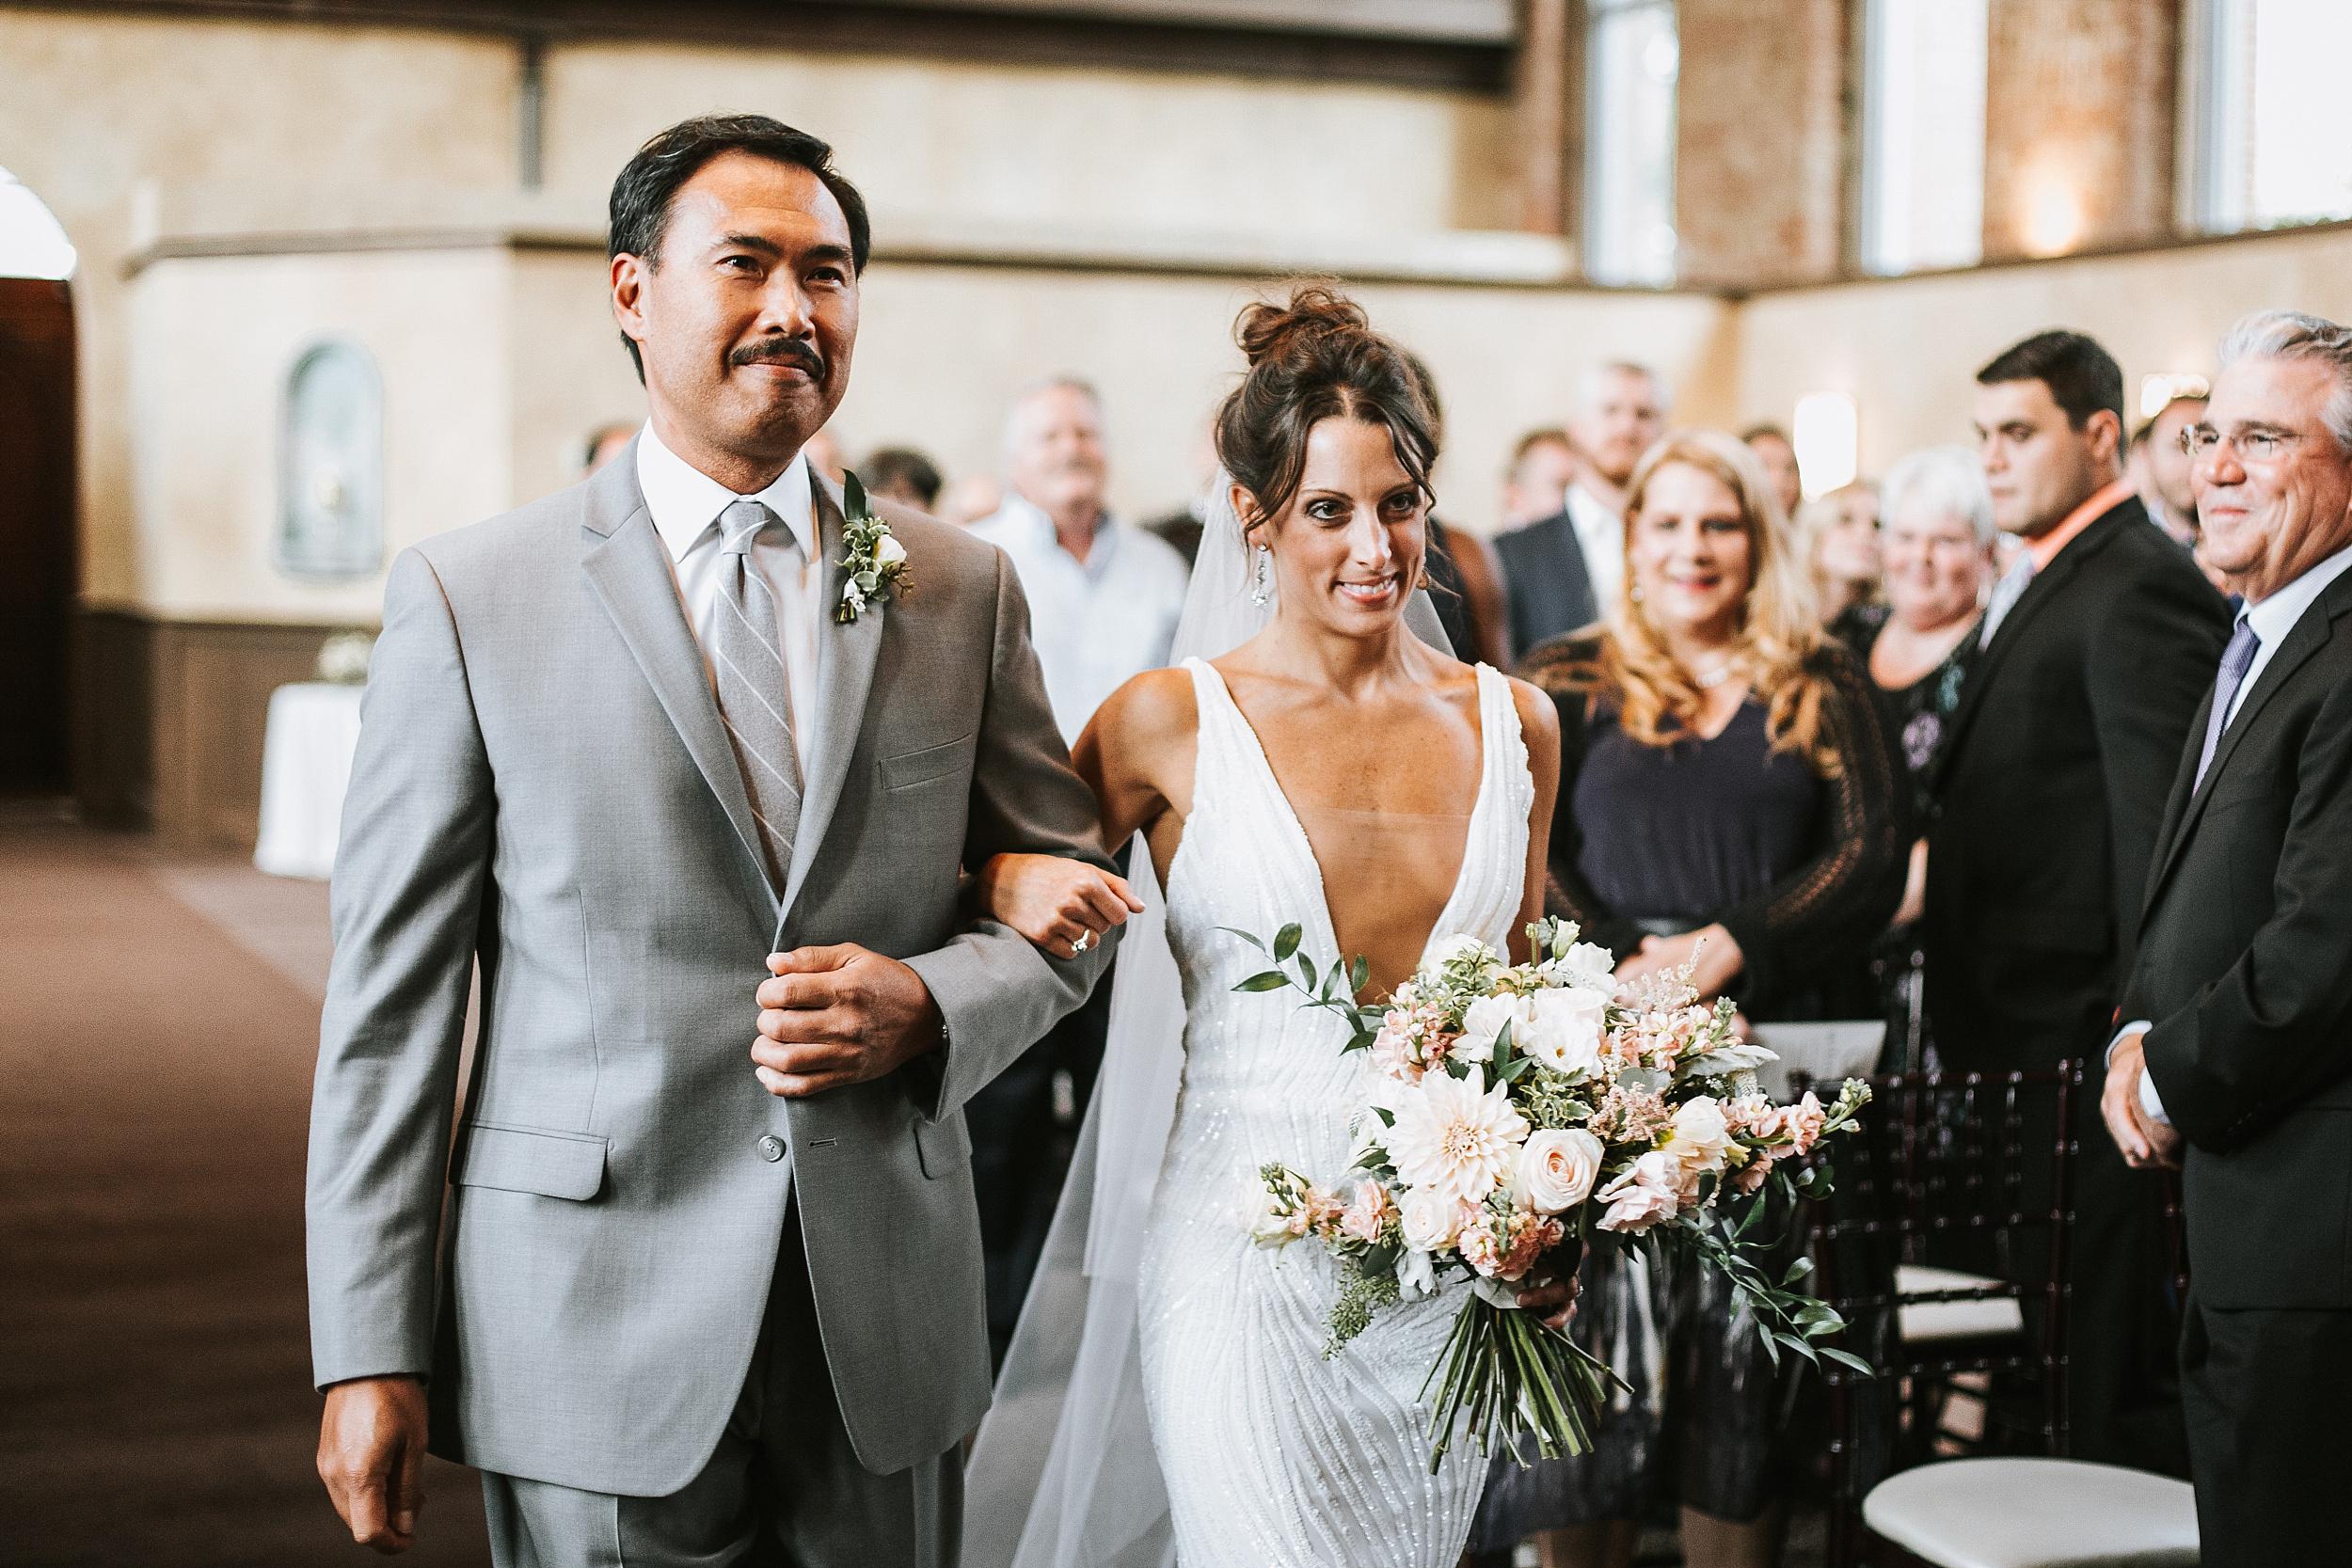 Brooke Townsend Photography - Cincinnati Wedding Photographer (110 of 170).jpg